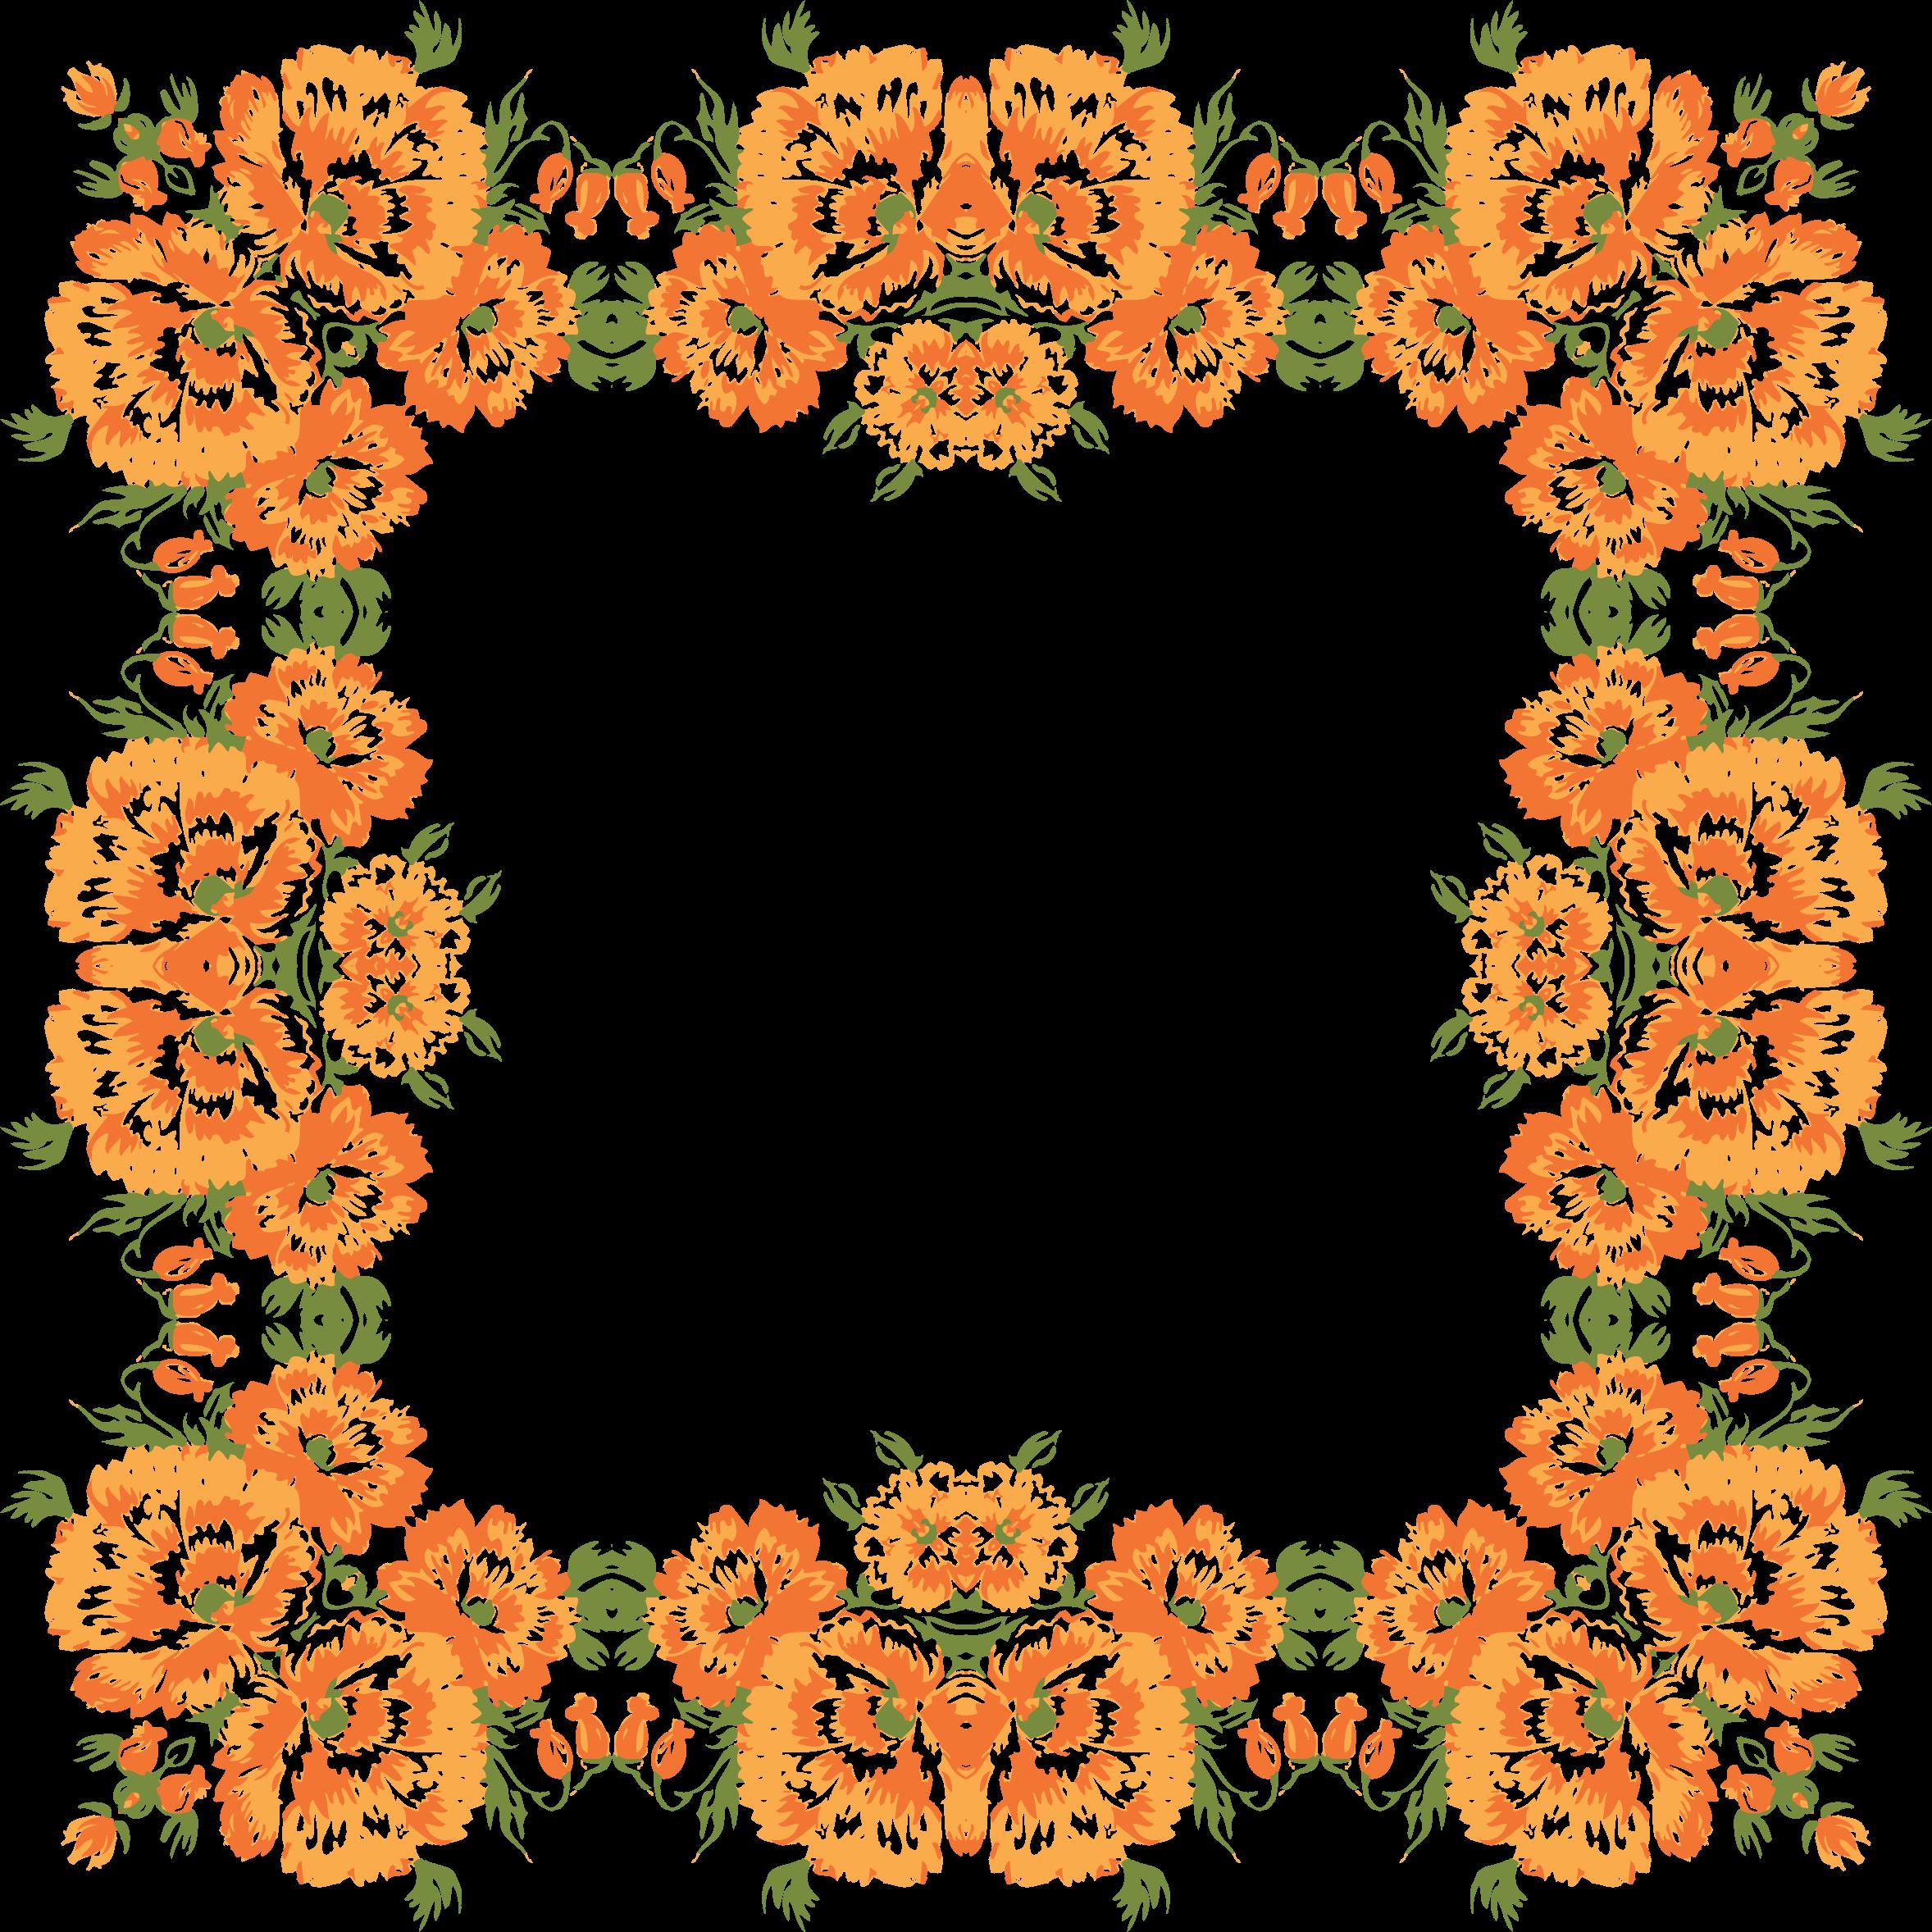 Floral wreath frame big. Garland clipart marigold